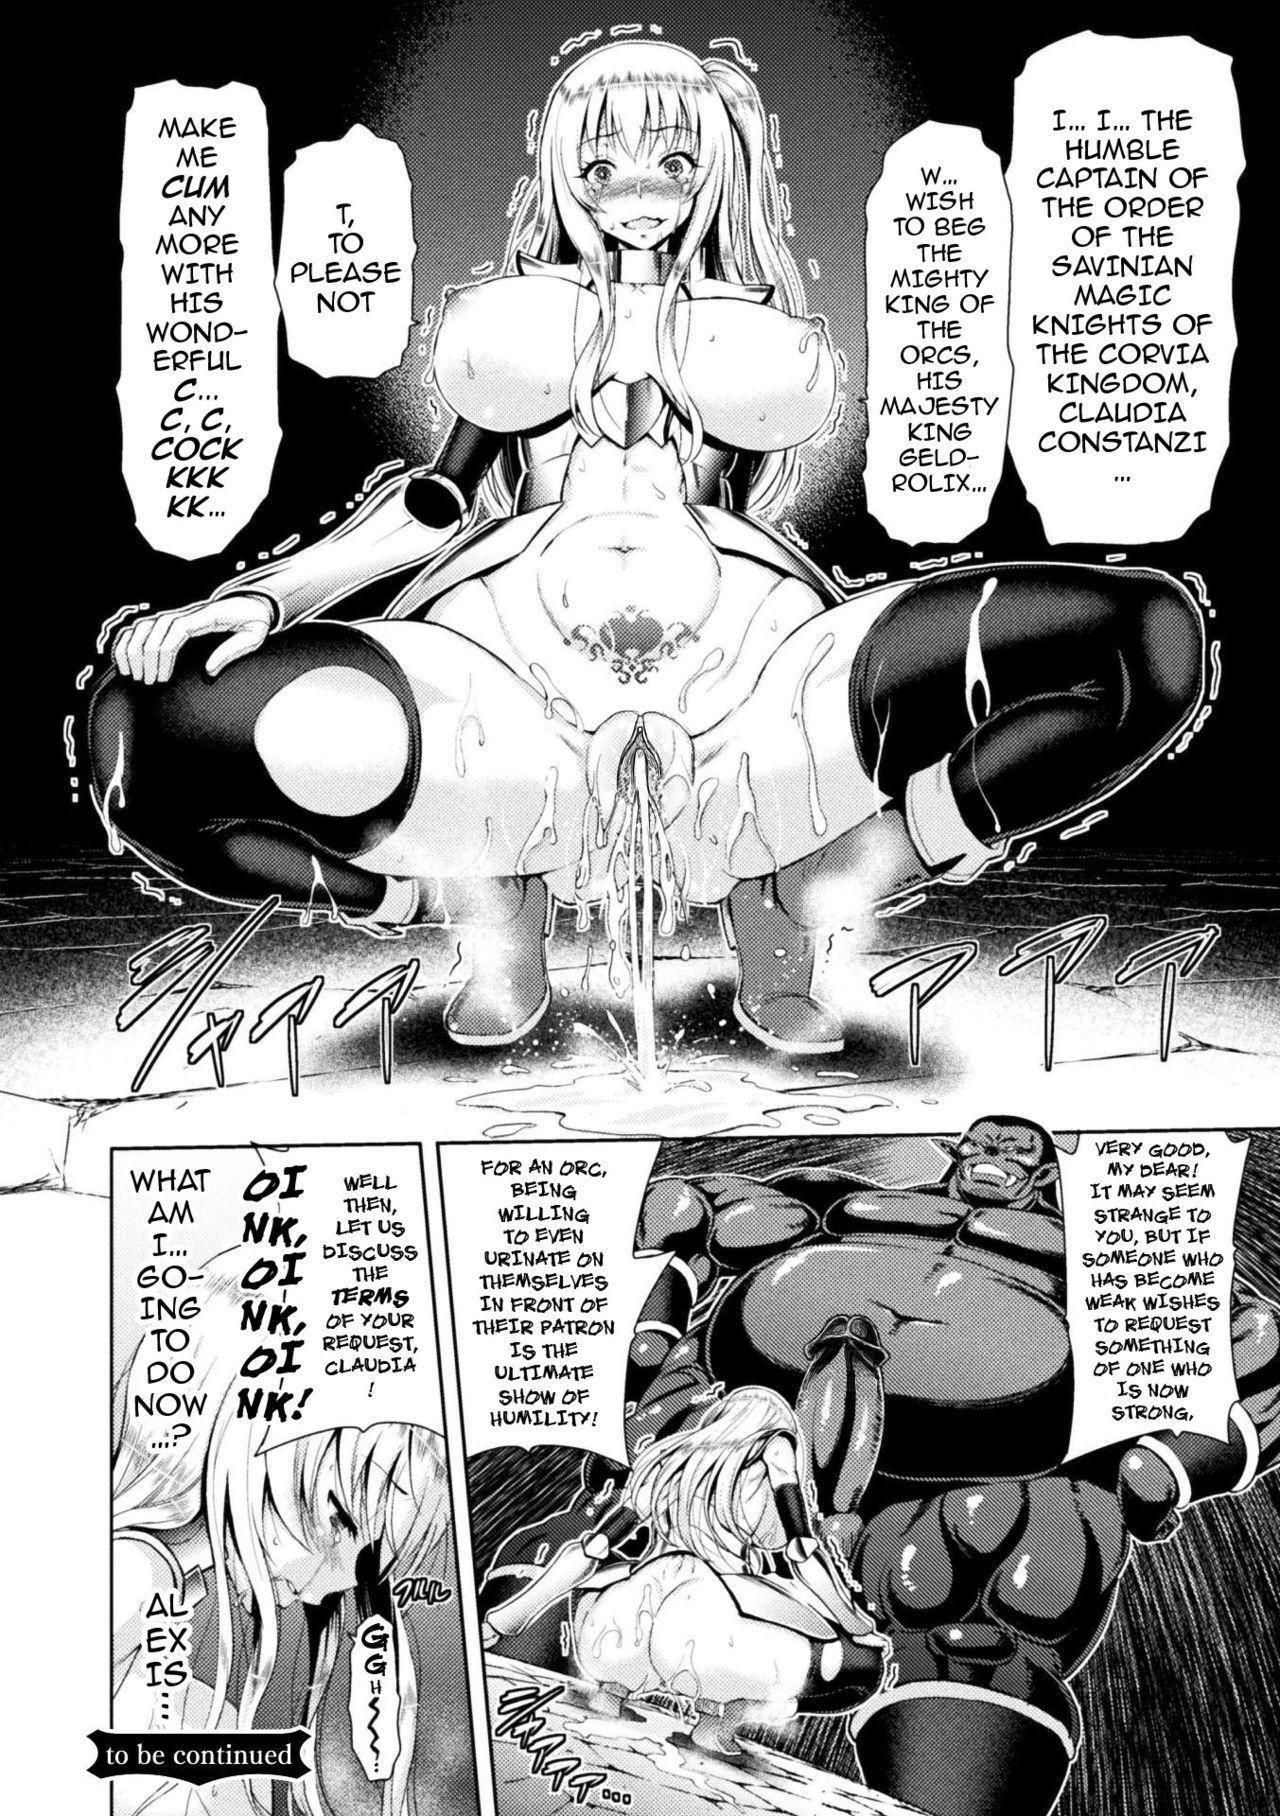 [Yamada Gogogo] Erona ~Orc no Inmon ni Okasareta Onna Kishi no Matsuro~ | Erona ~The Fall of a Beautiful Knight Cursed with the Lewd Mark of an Orc~ Ch. 1-6 [English] [darknight] [Decensored] [ongoing] 47